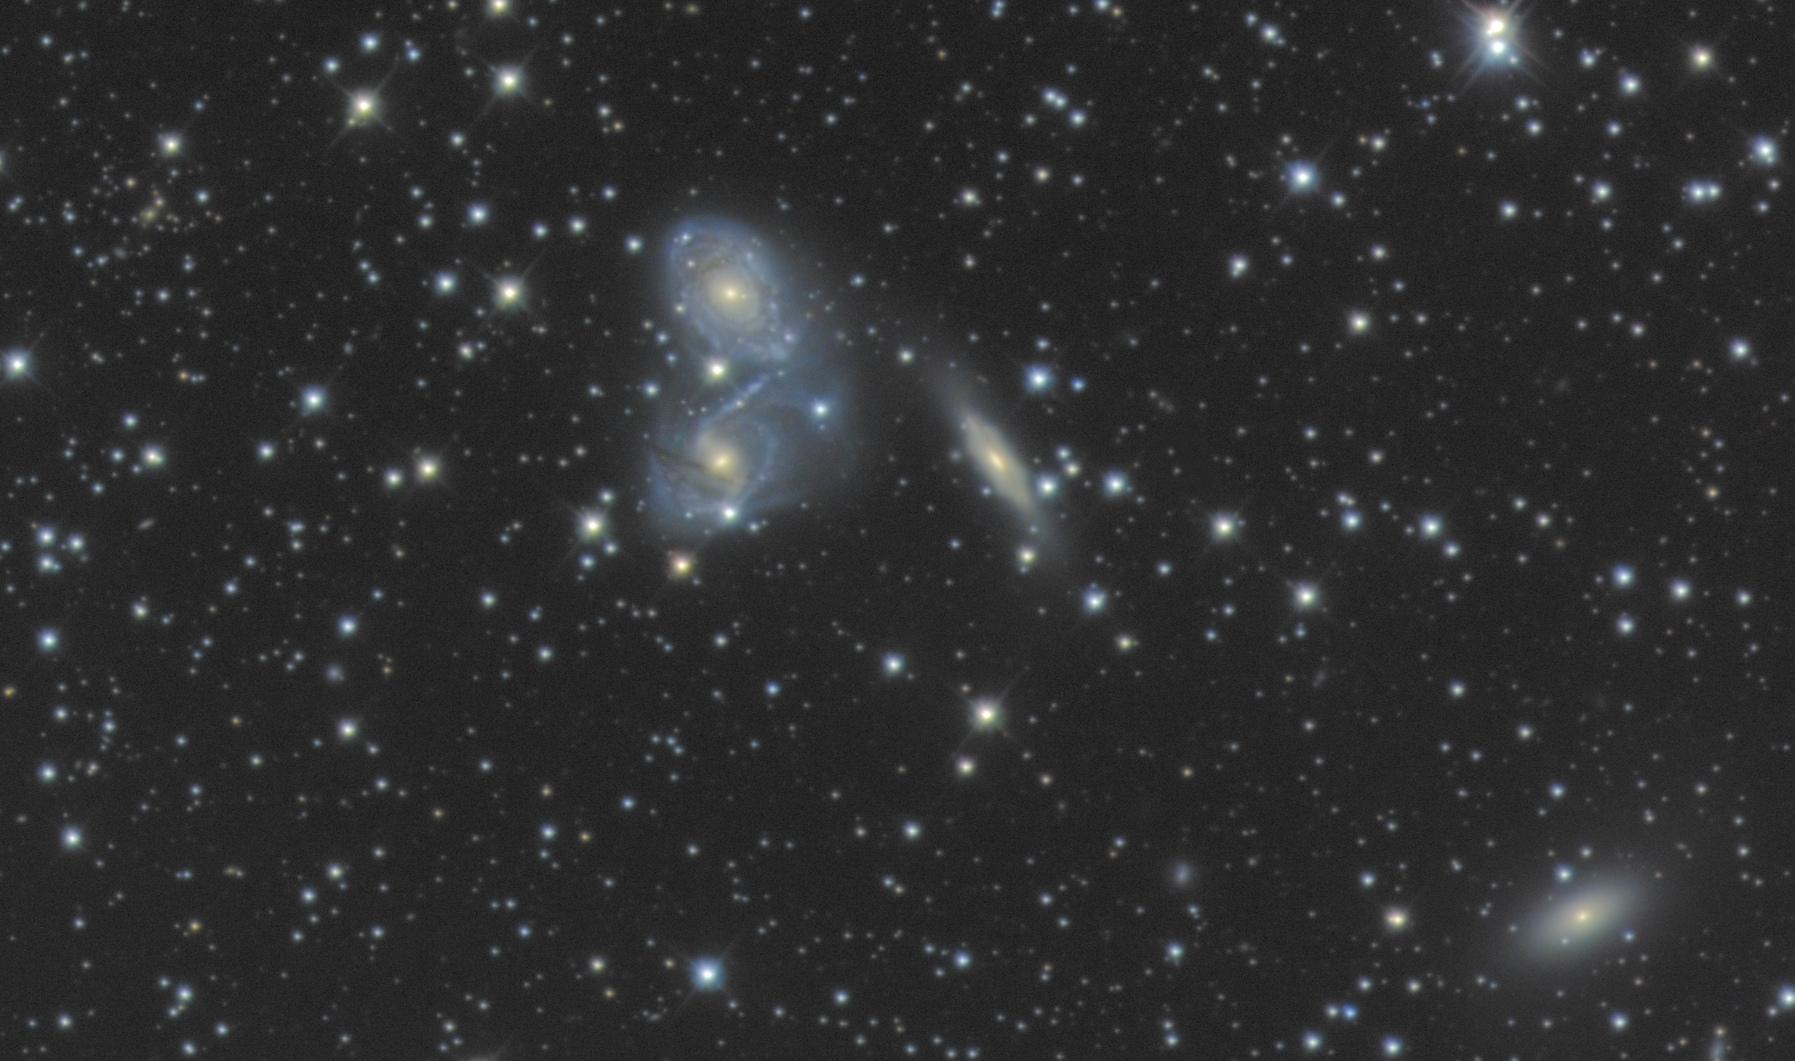 5d92d02e45606_zoomgalaxies.jpg.1fd07be39a31db4d72b787091dcc0ba1.jpg